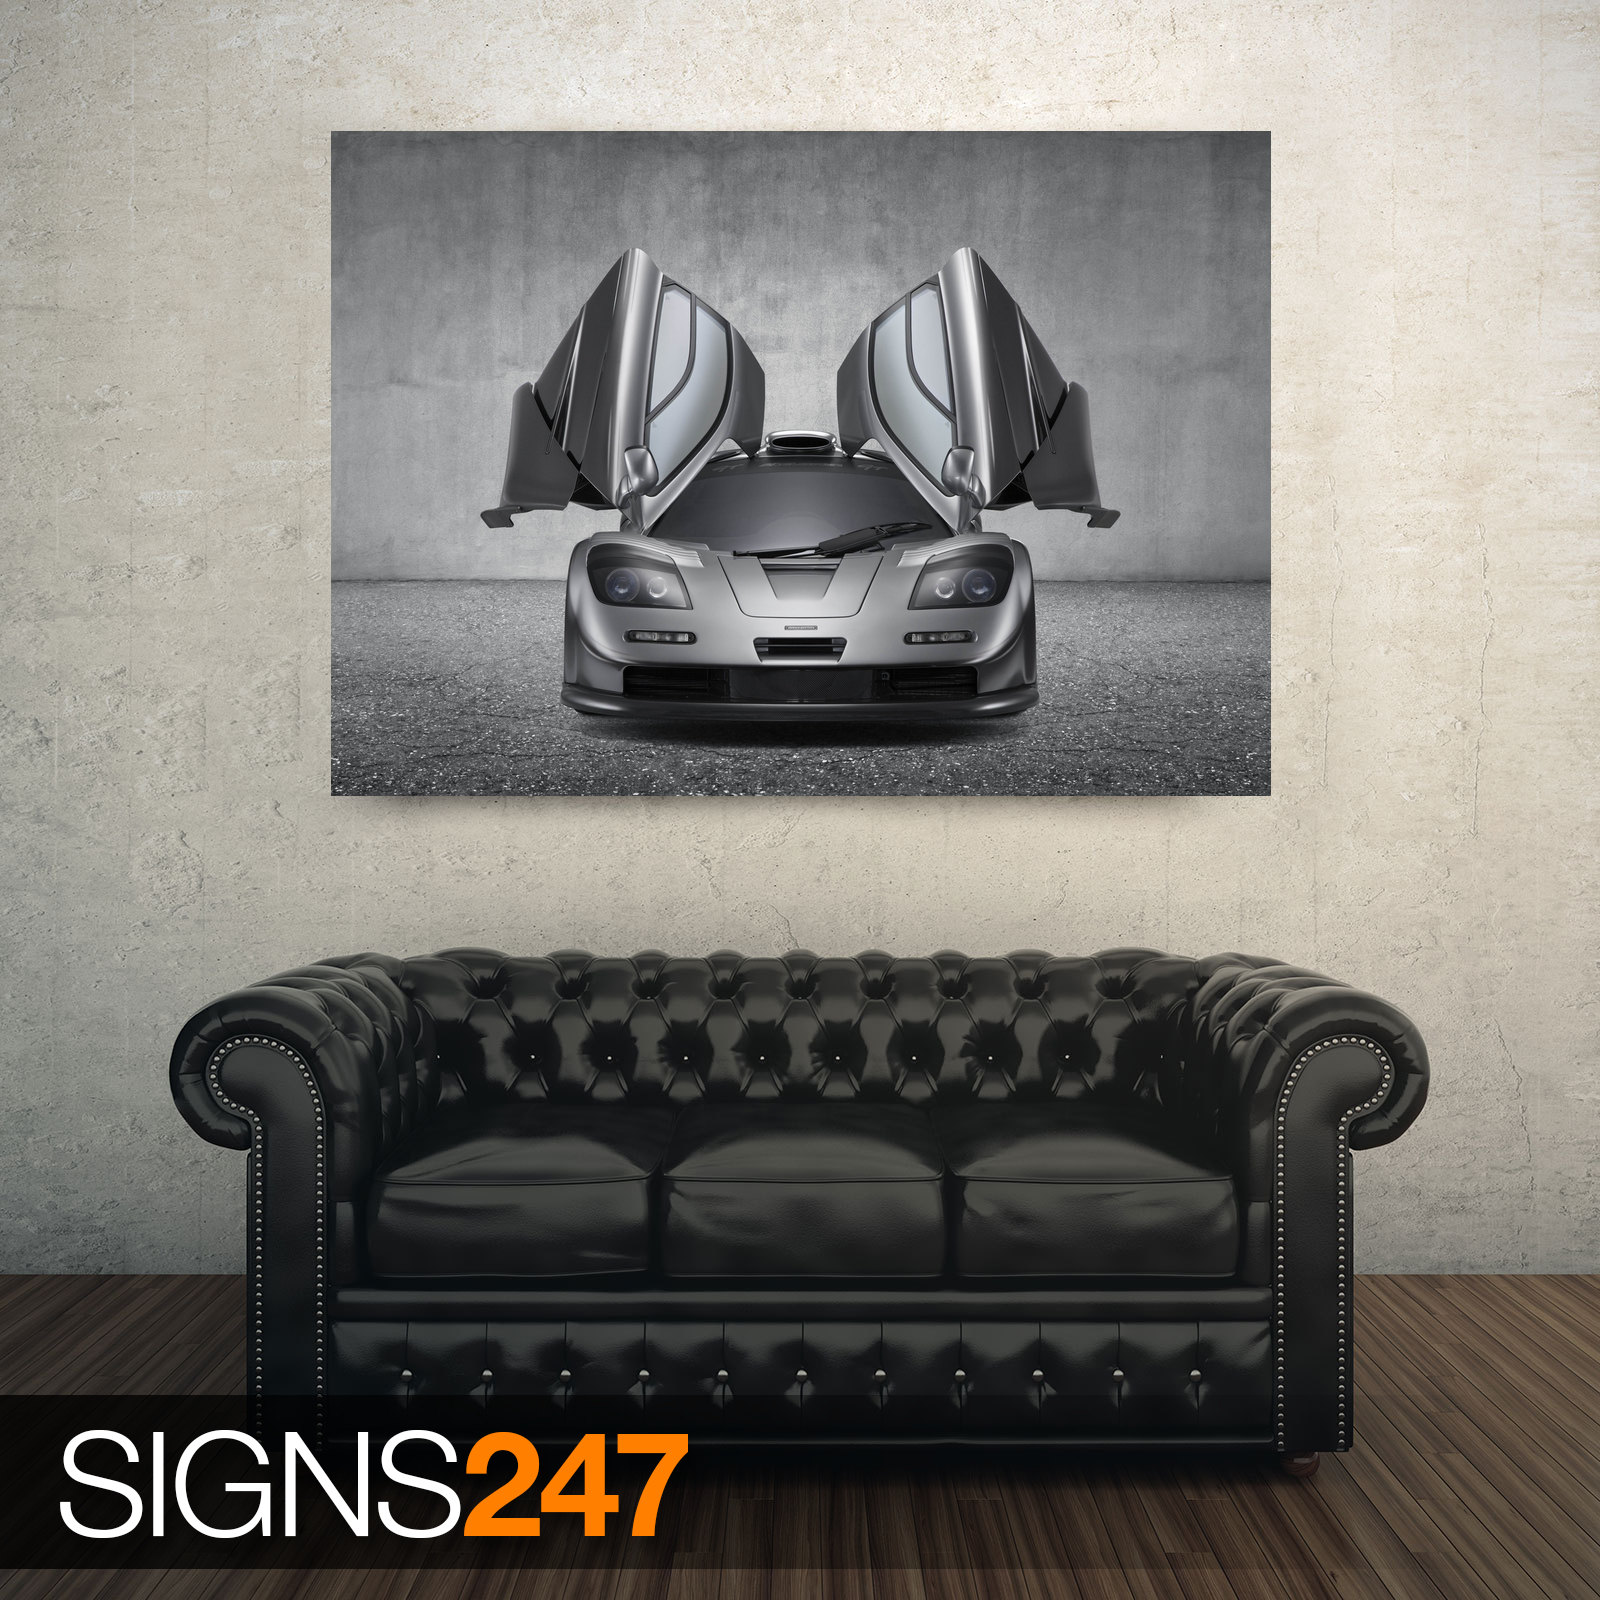 MCLAREN-F1-GT-SUPERCAR-AD746-CAR-POSTER-Photo-Poster-Print-Art-All-Sizes